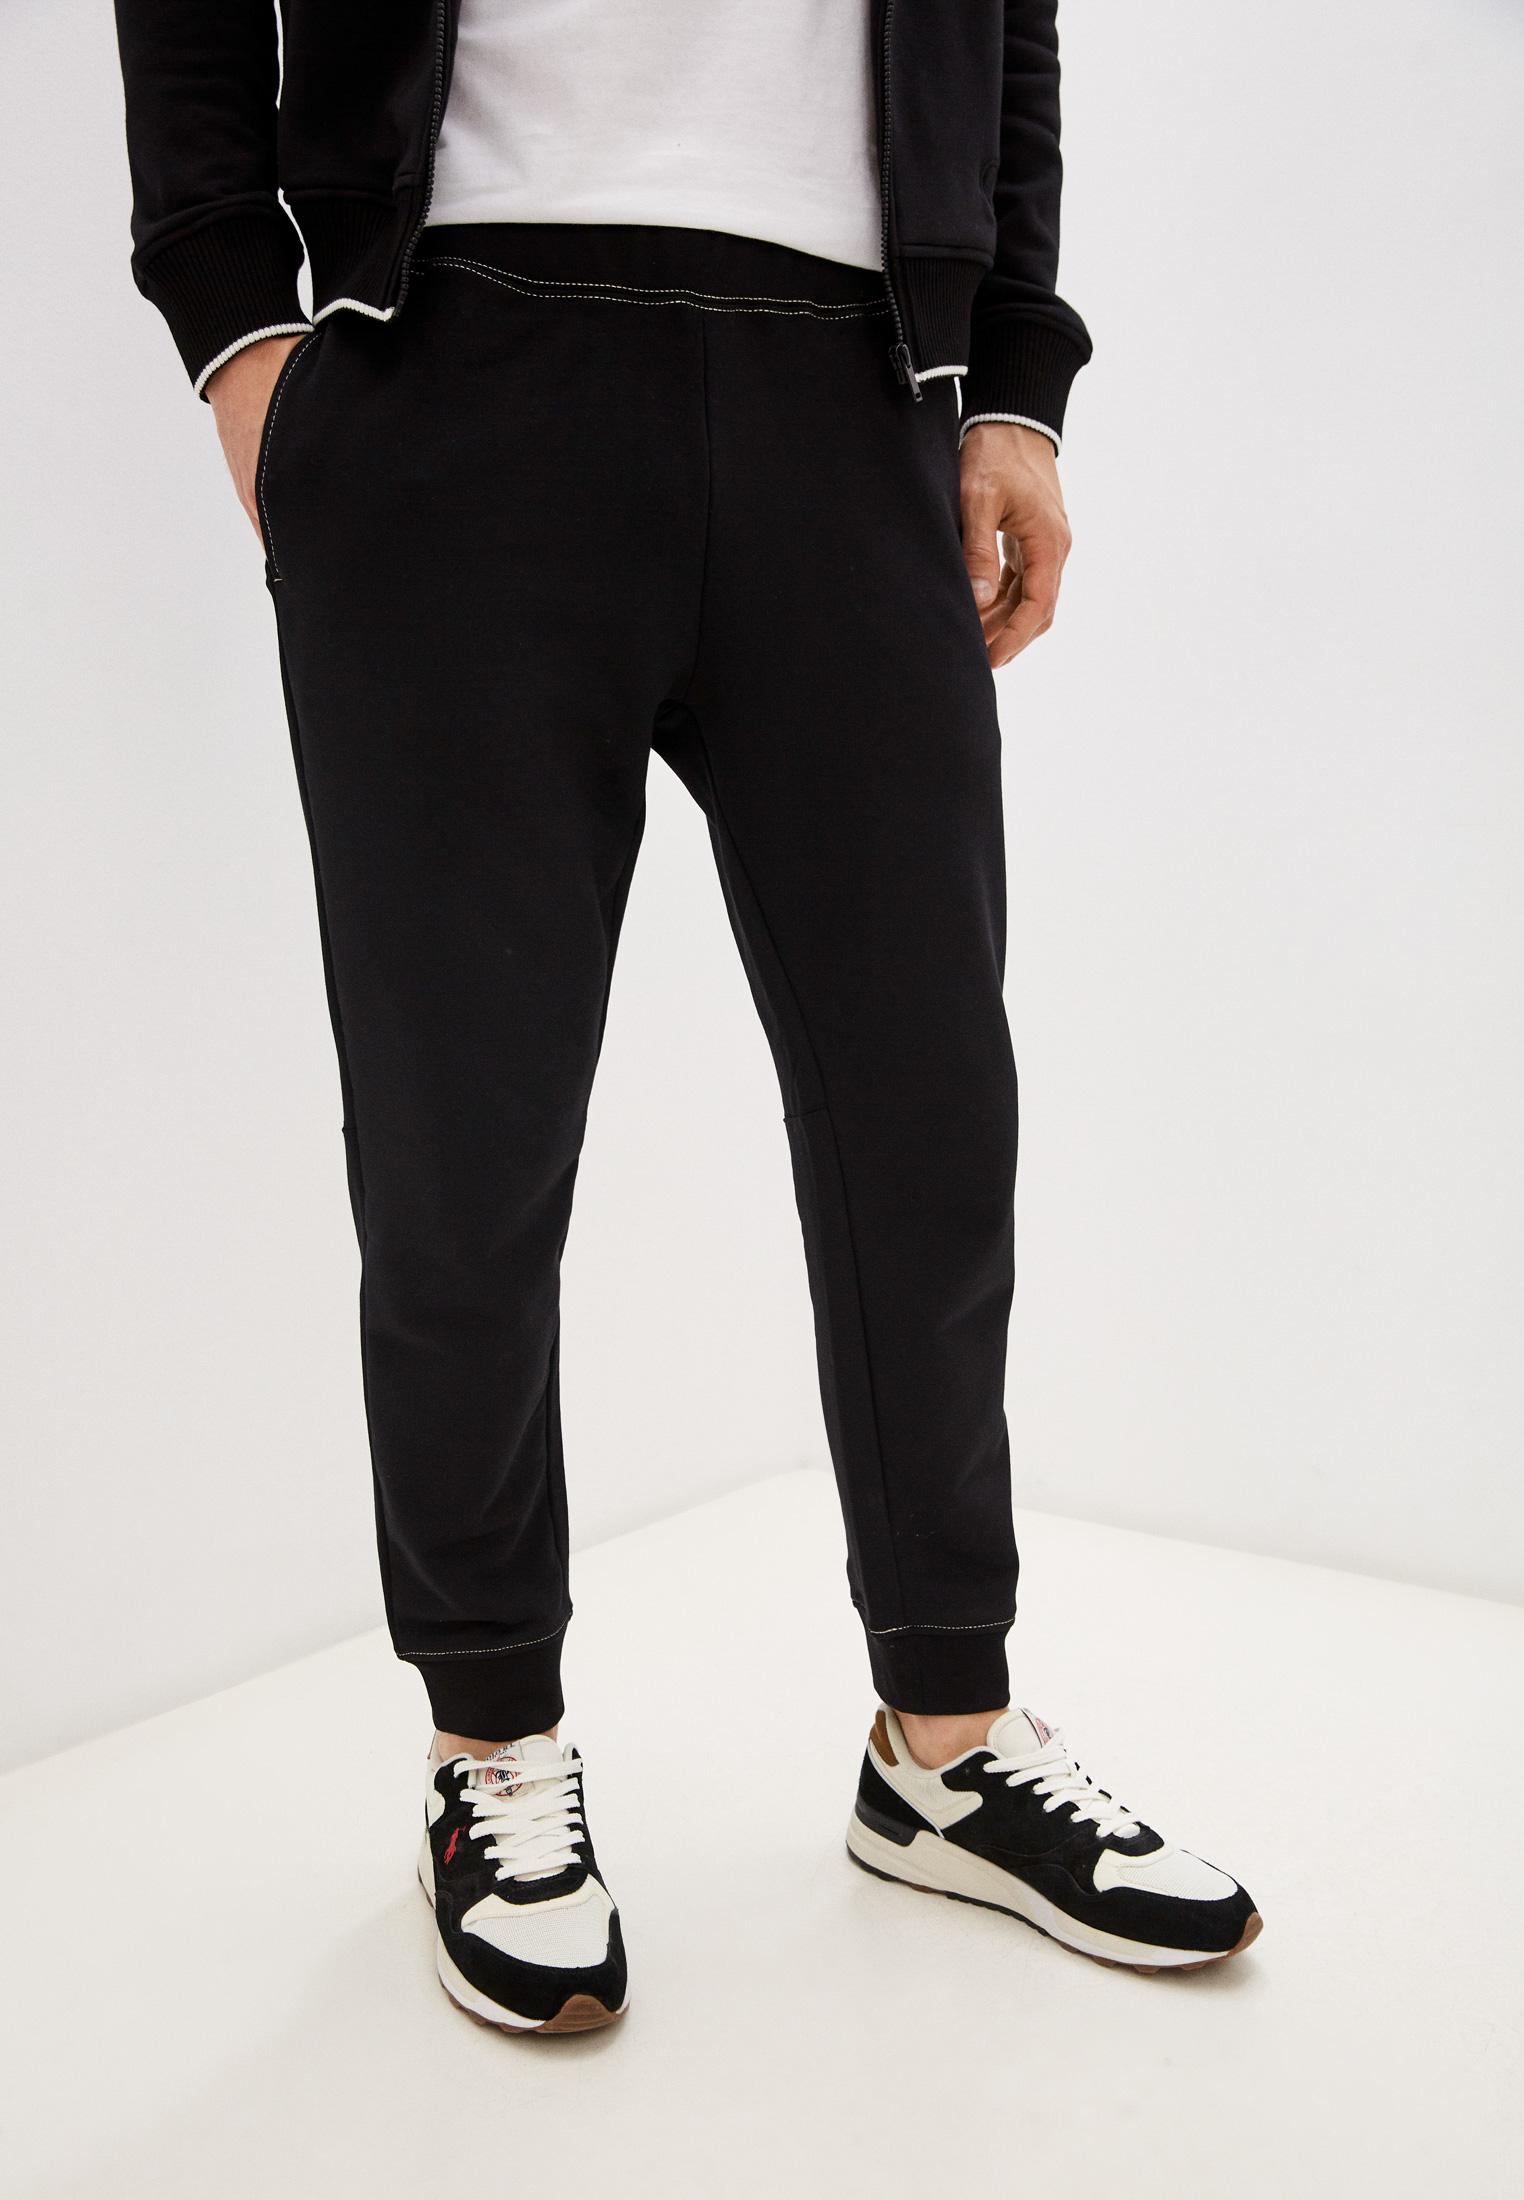 Мужские спортивные брюки Emporio Armani (Эмпорио Армани) 6K1PA5 1JSCZ